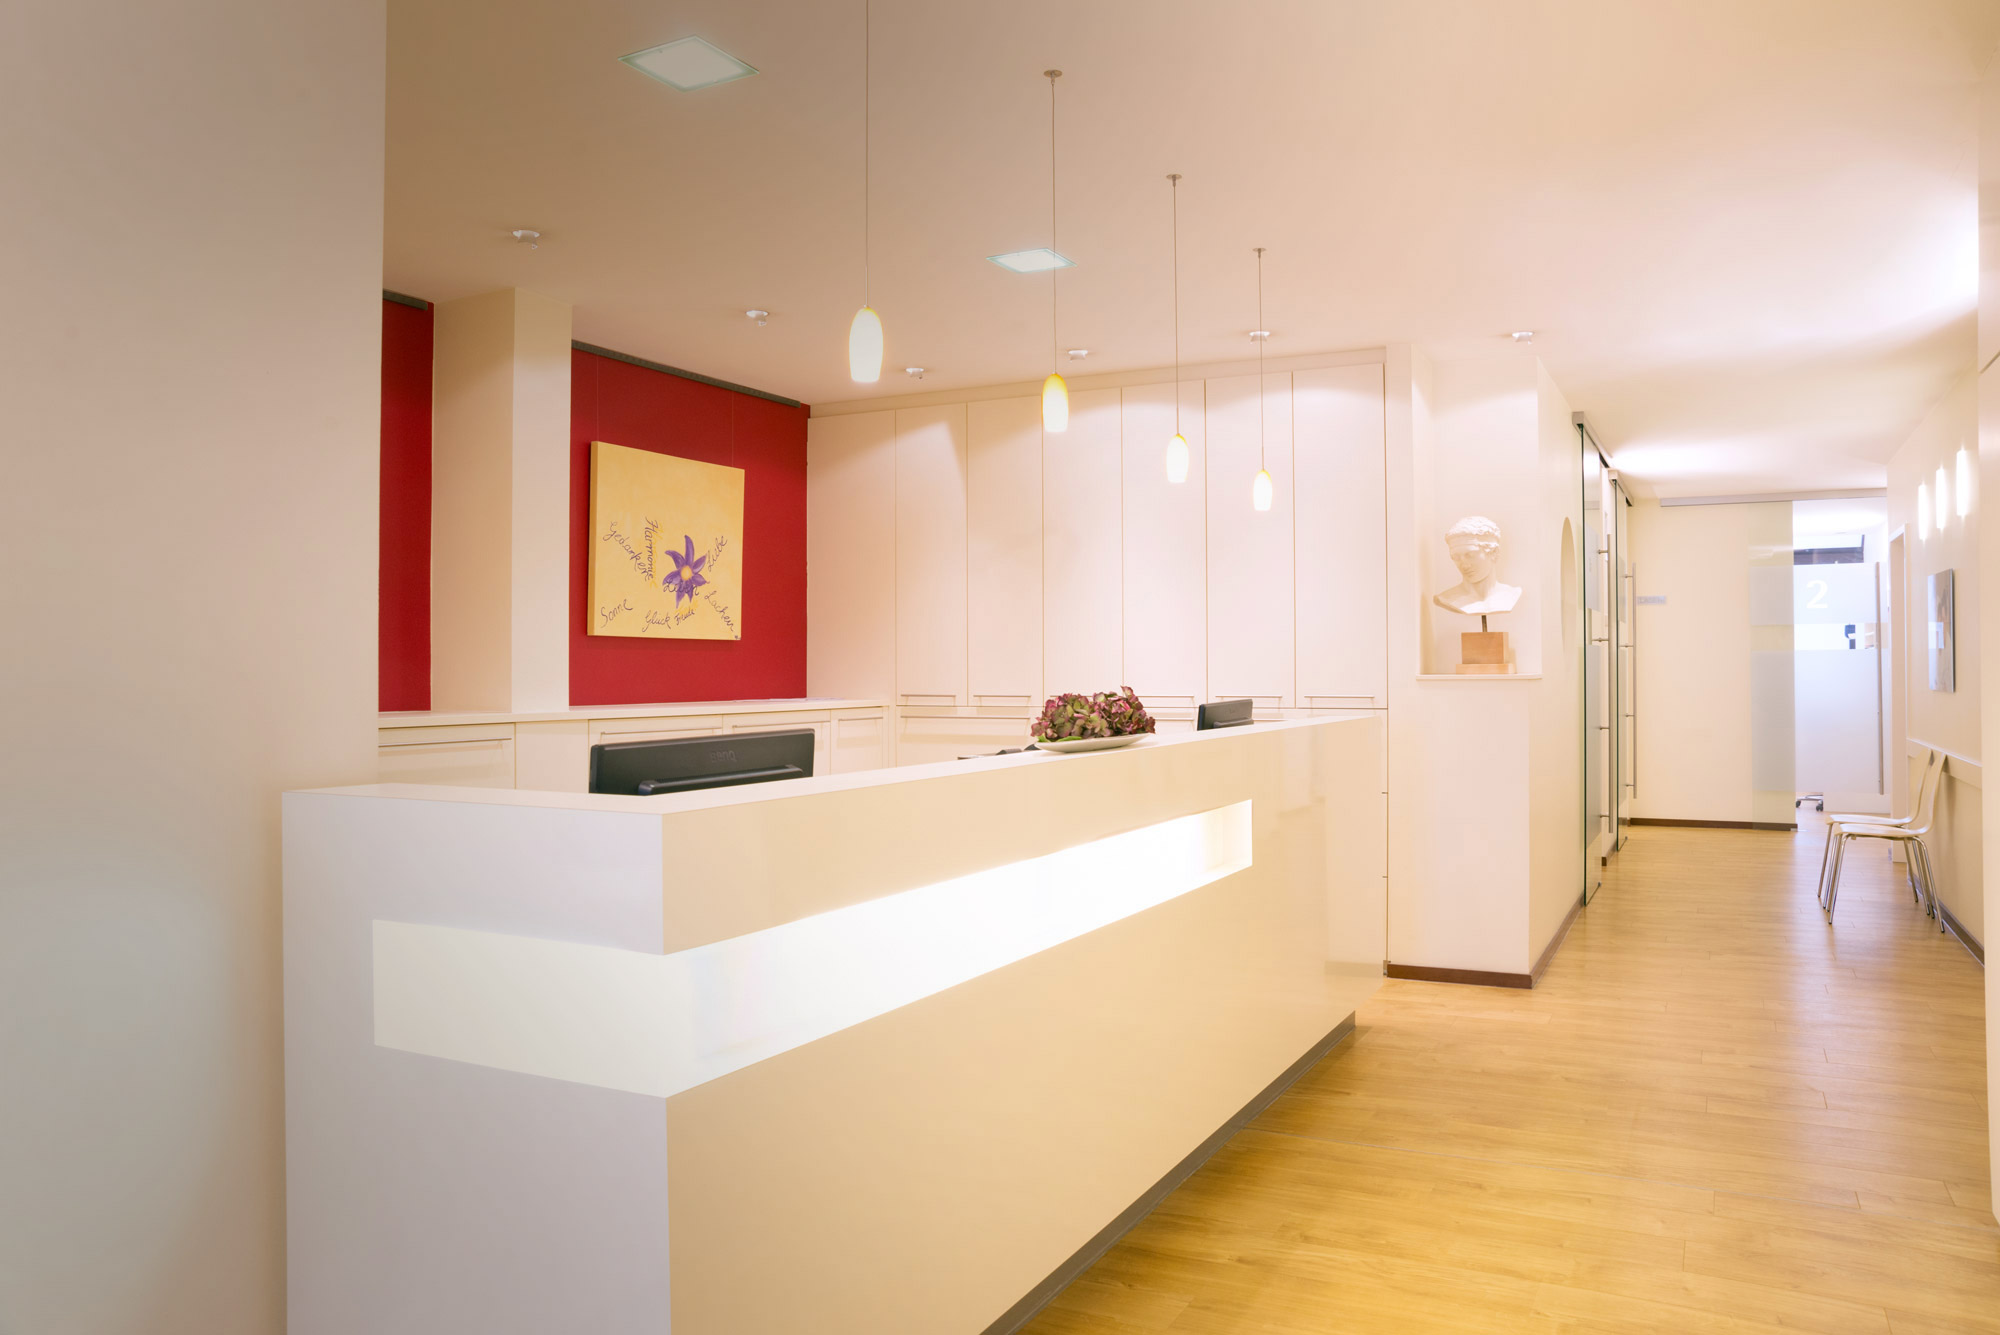 Faq Smile Design Studio Georg Georgi Dr A Koniaris Koln